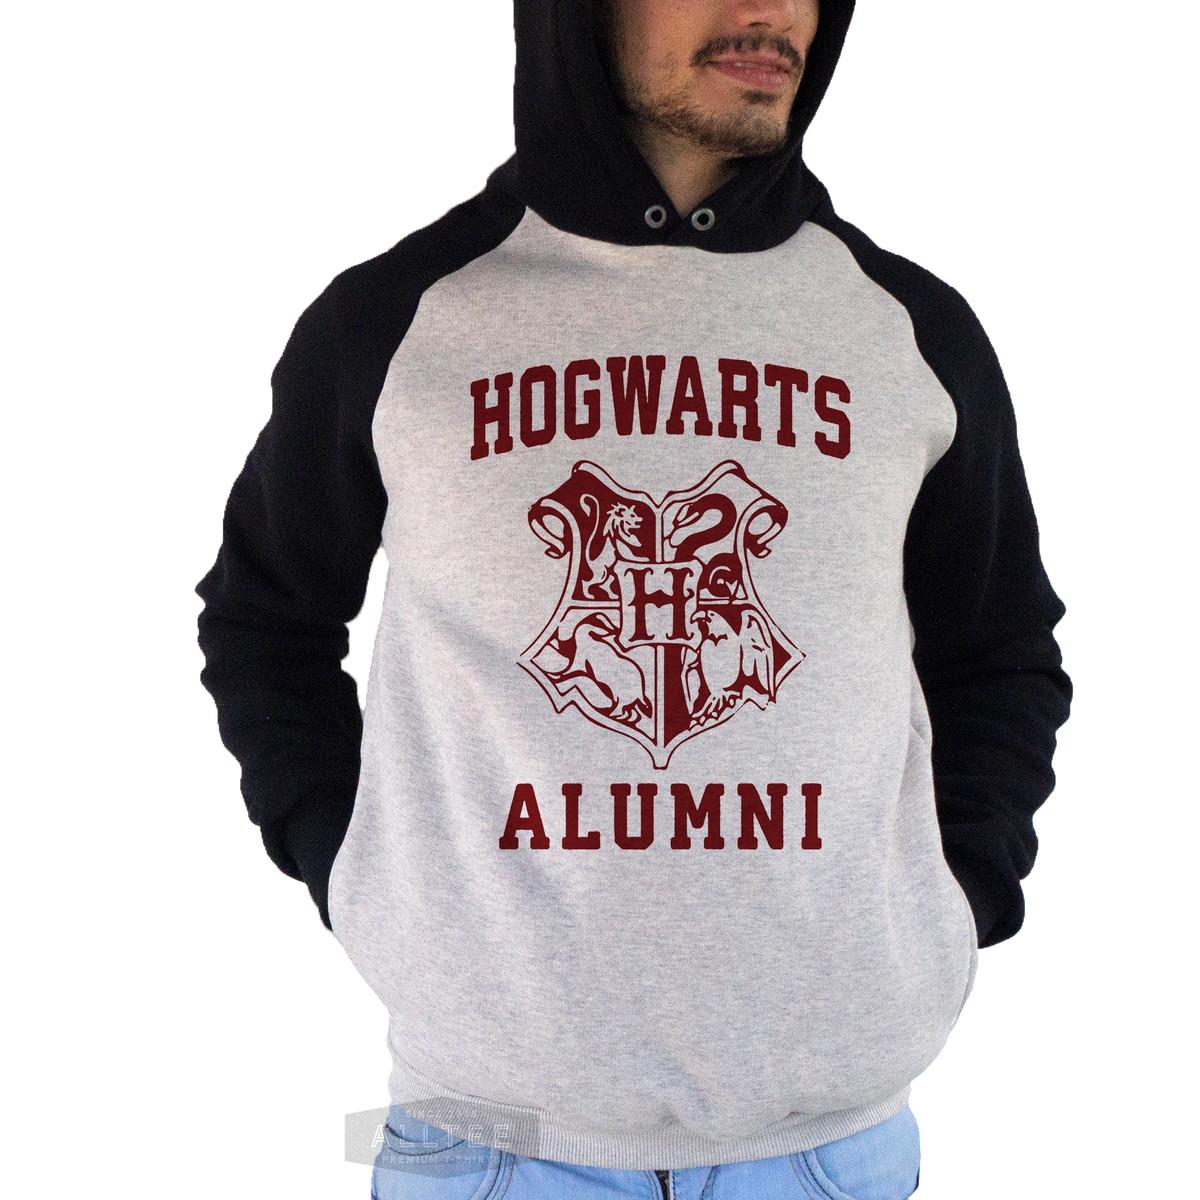 650a146217f1 Moletom Blusa Raglan Hogwarts Alumni Harry Potter Draco Ron no Elo7 ...